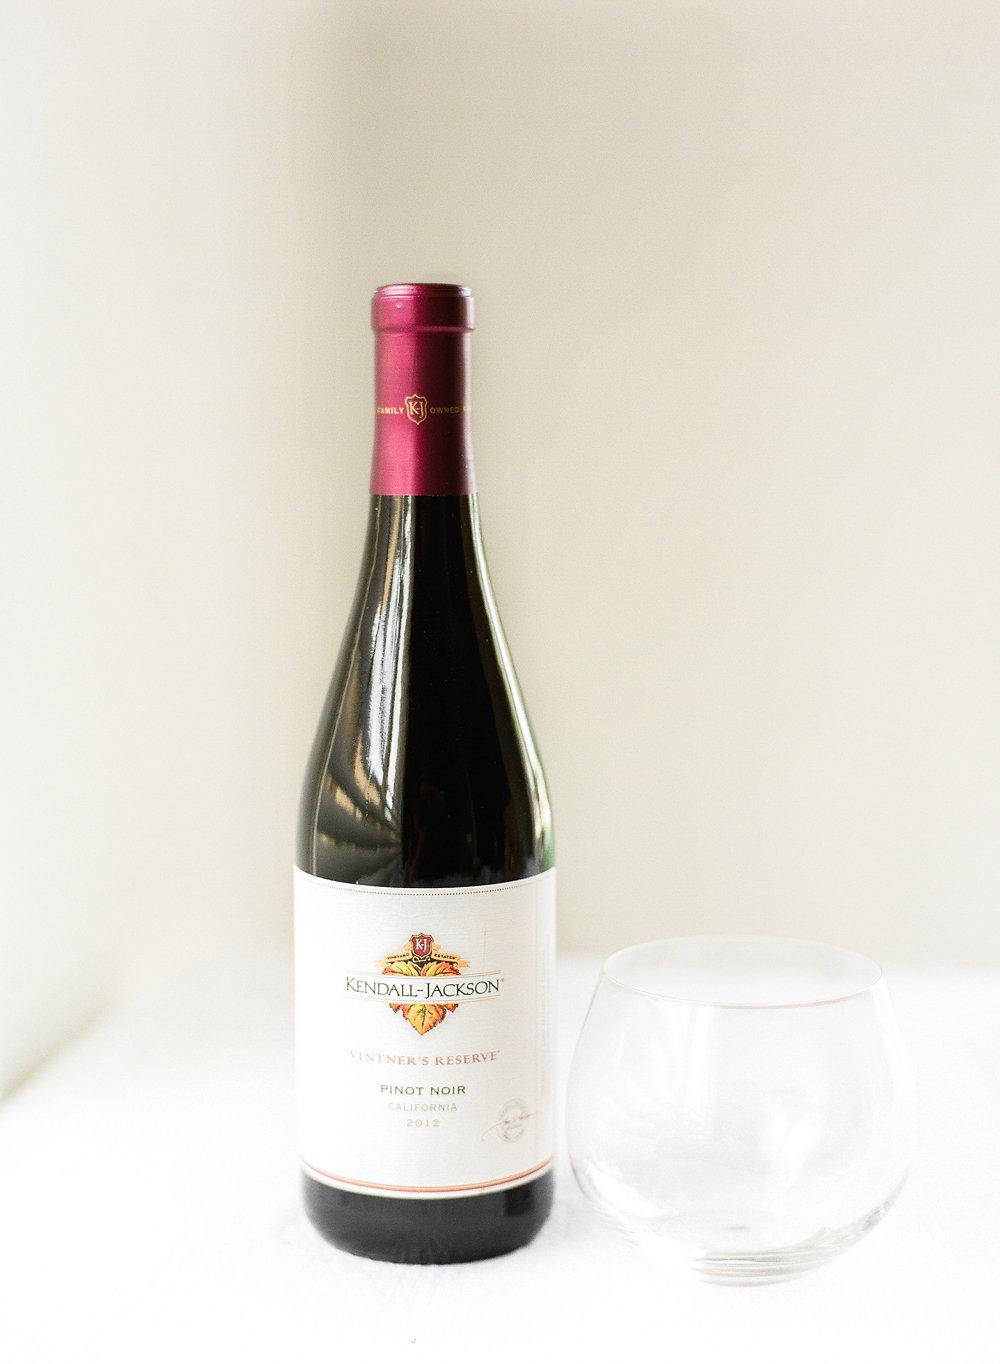 Blackberry Pistachio Flatbread with Vintner's Reserve Pinot Noir